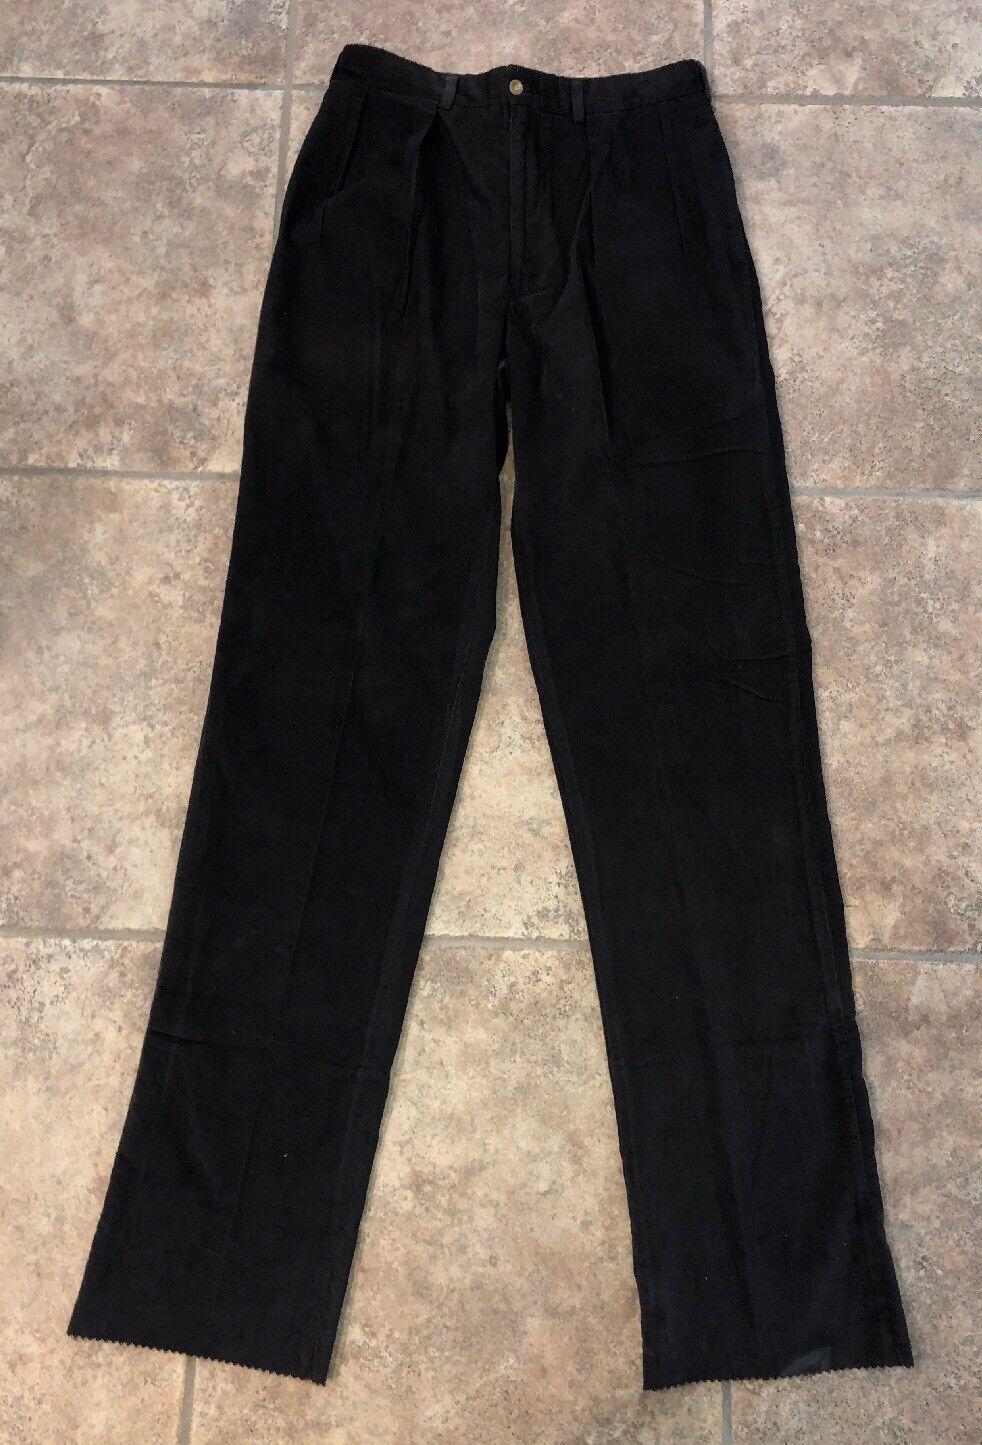 Bills Khakis Mens Casual Corduroy Pants Size 32 X 39 NEW